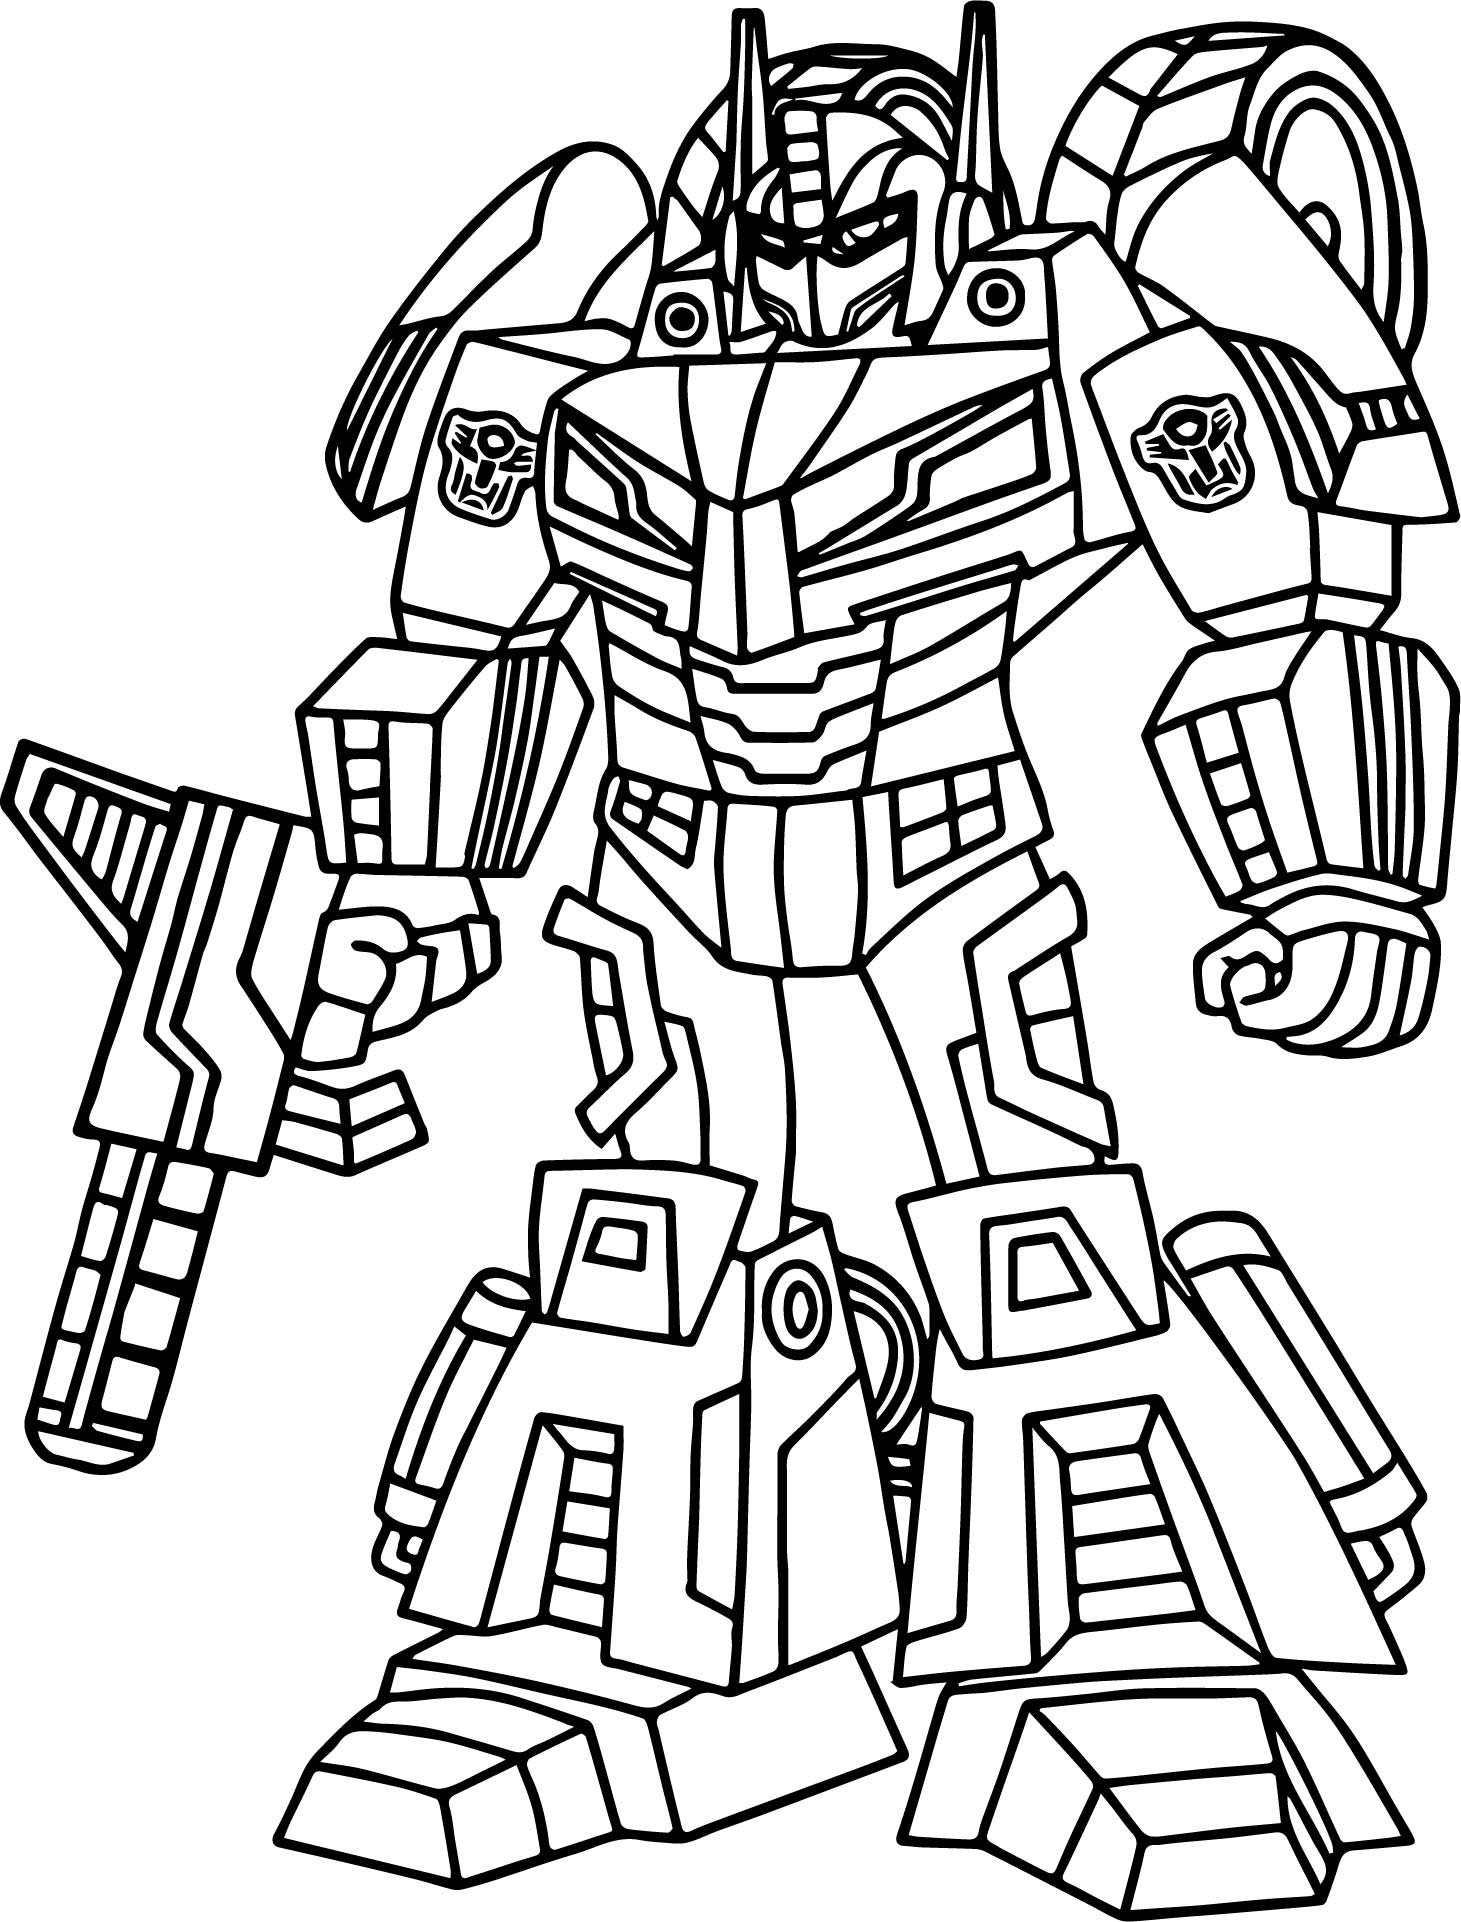 Impressionnant Dessin A Colorier Transformers Optimus Prime